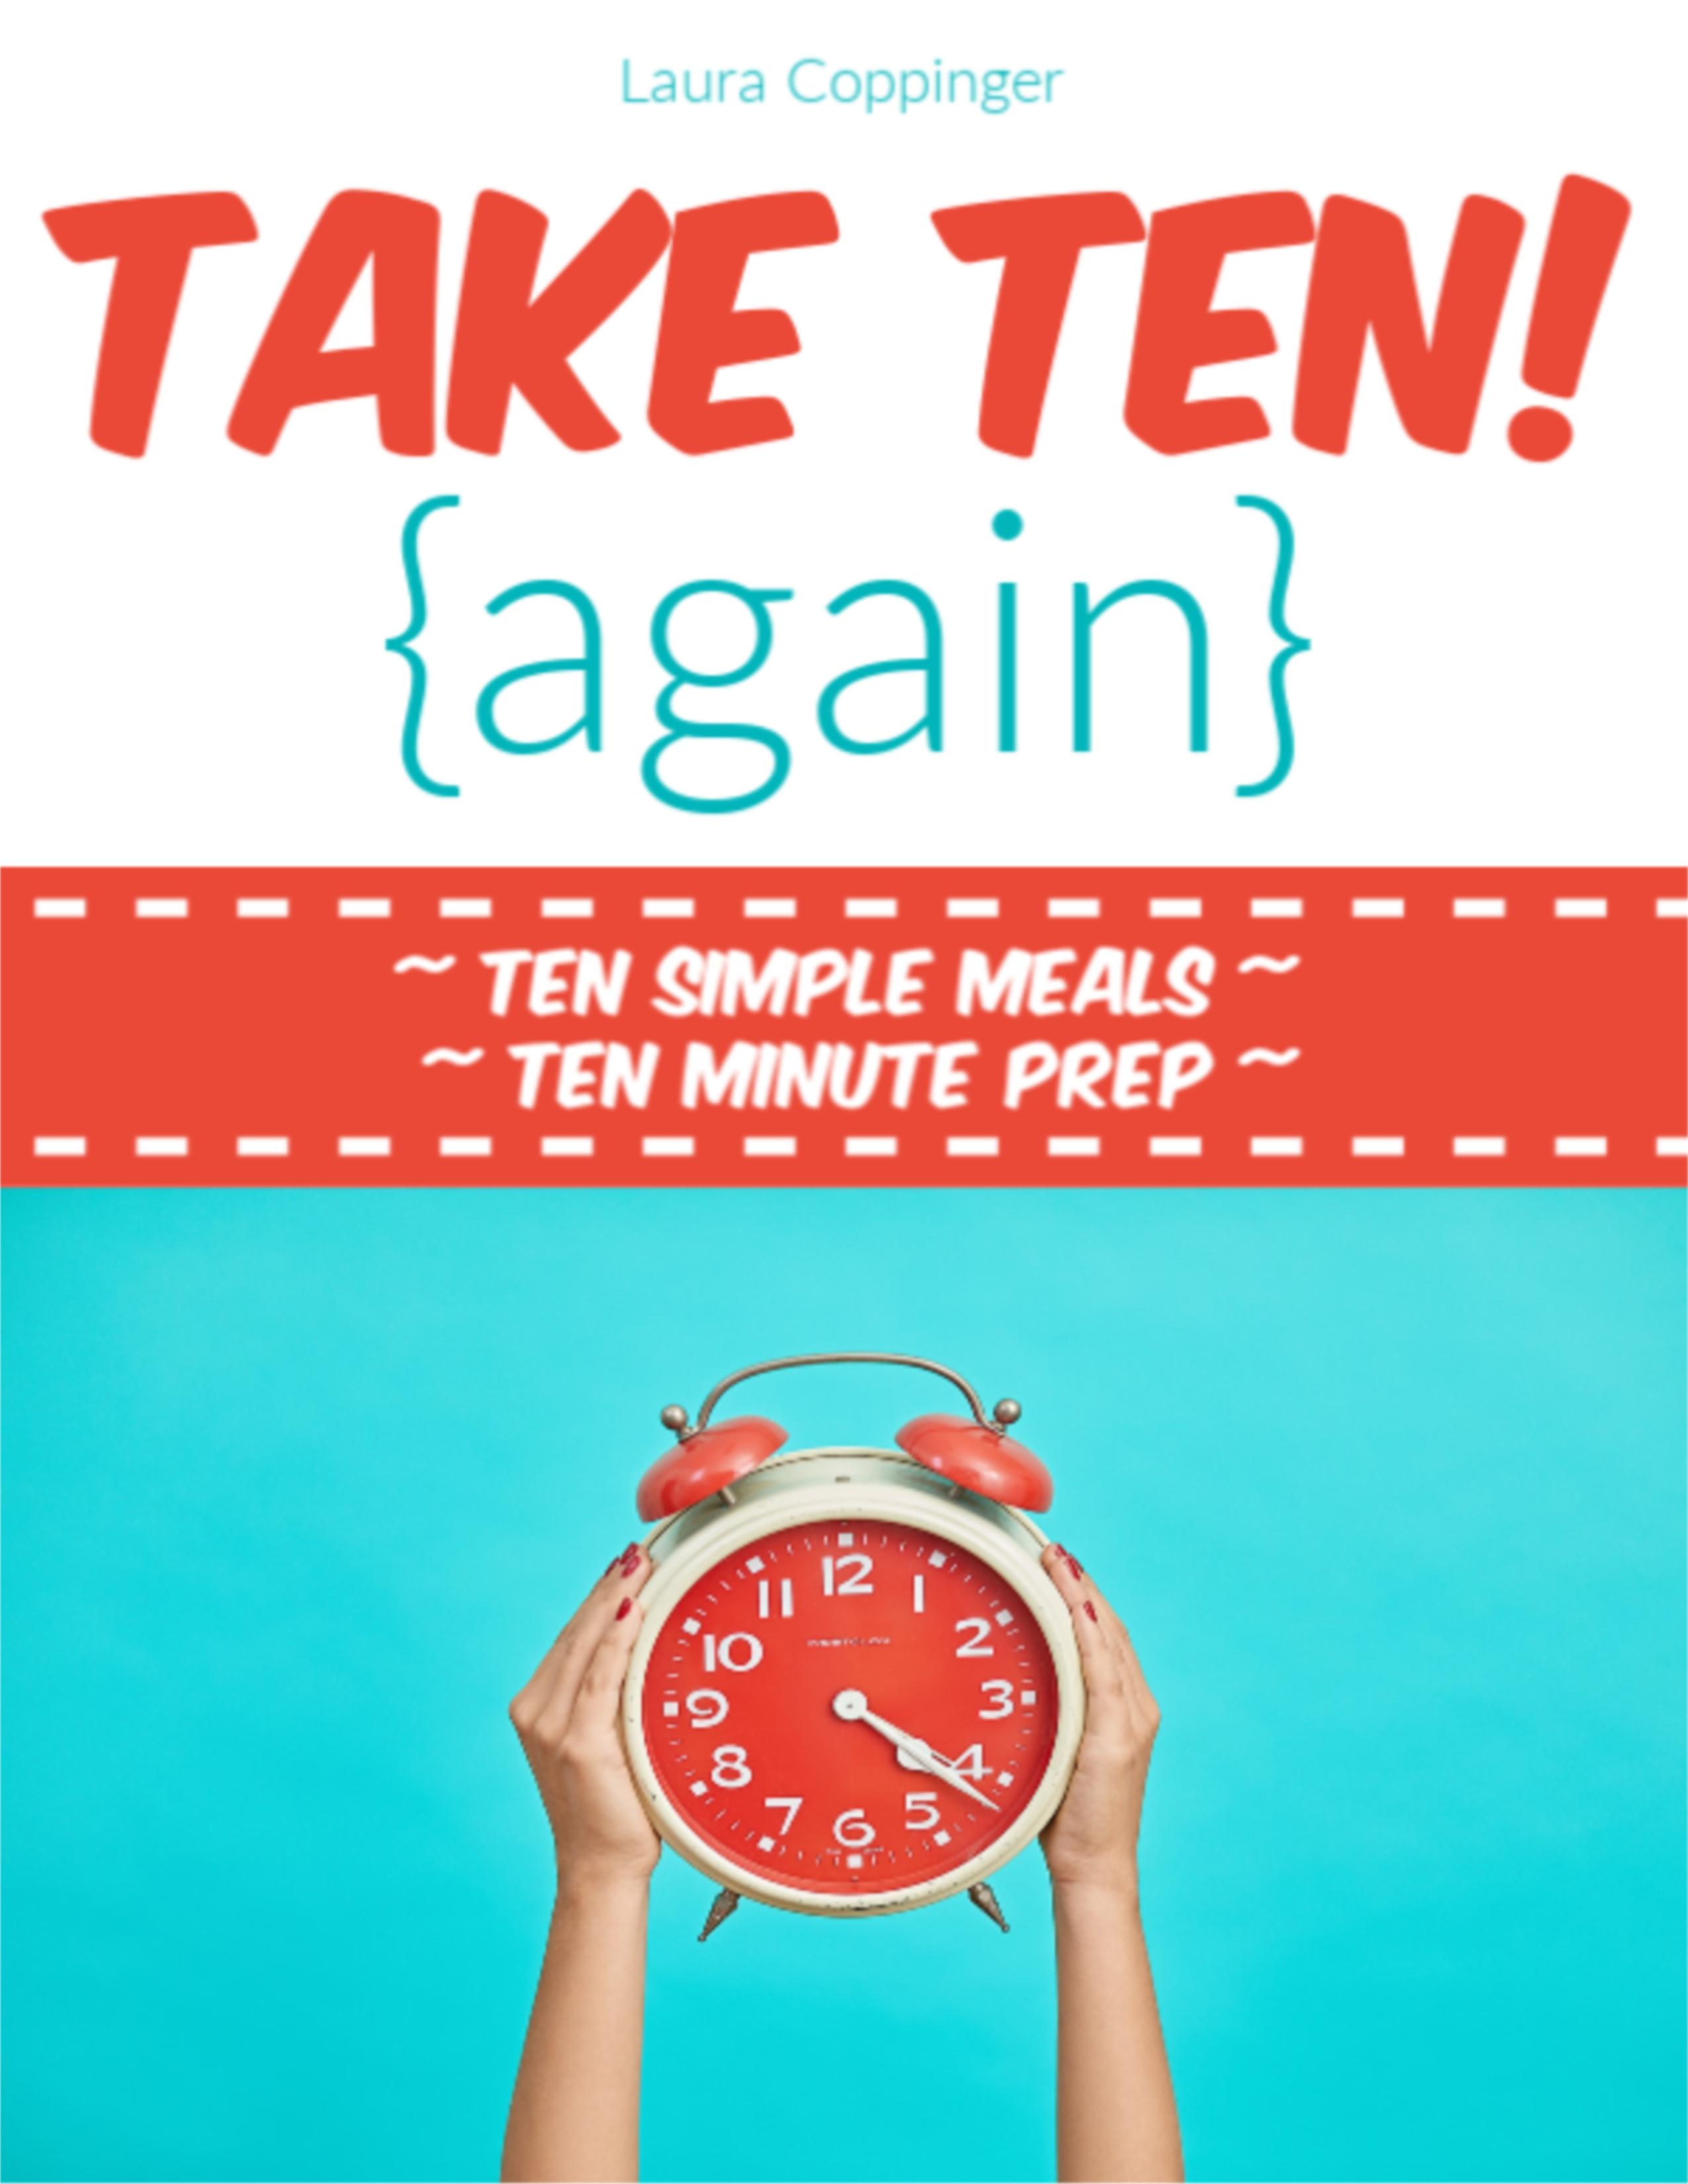 Take Ten AGAIN! Challenge Kit